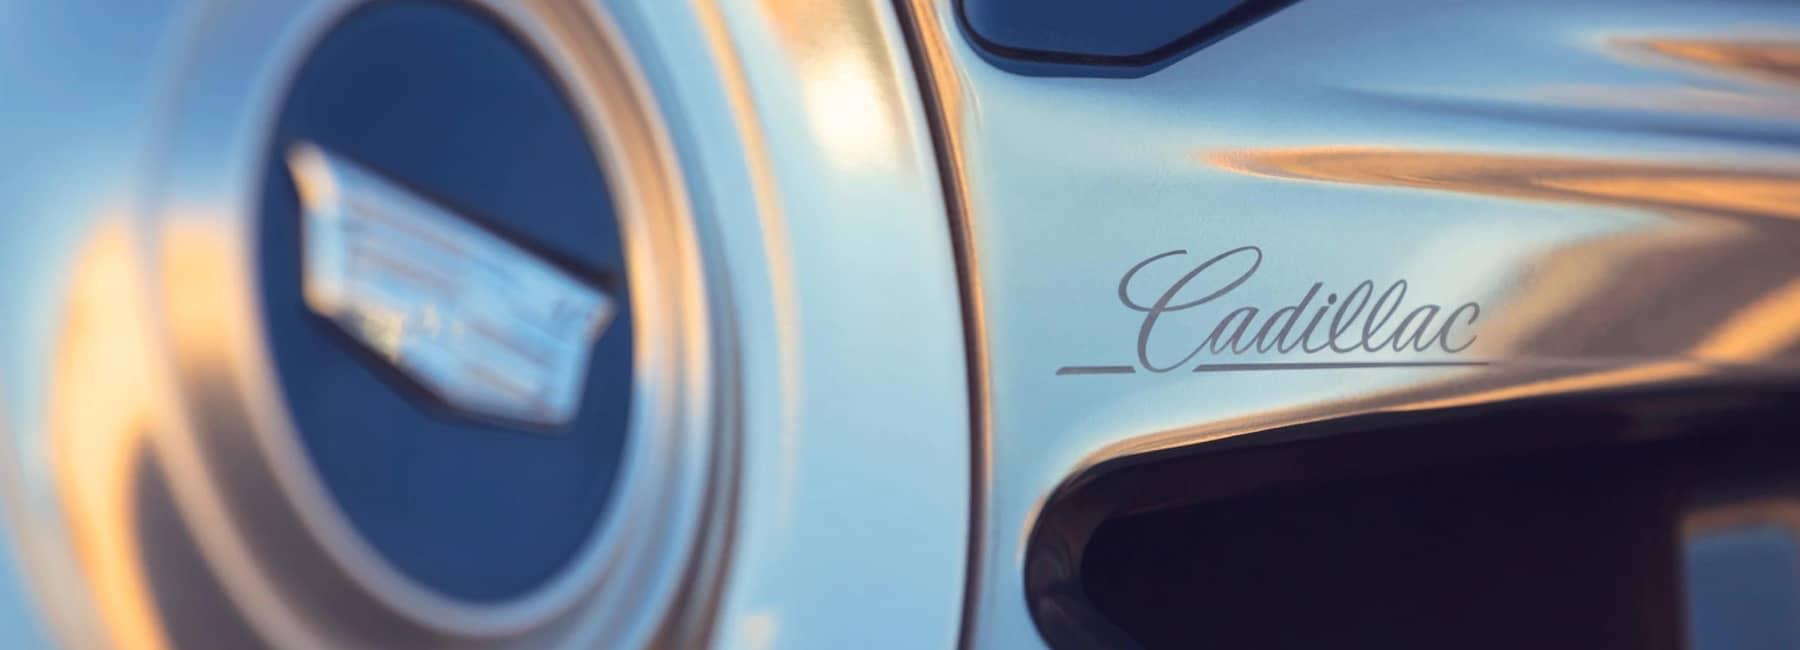 Cadillac Escalde Wheel Close Up